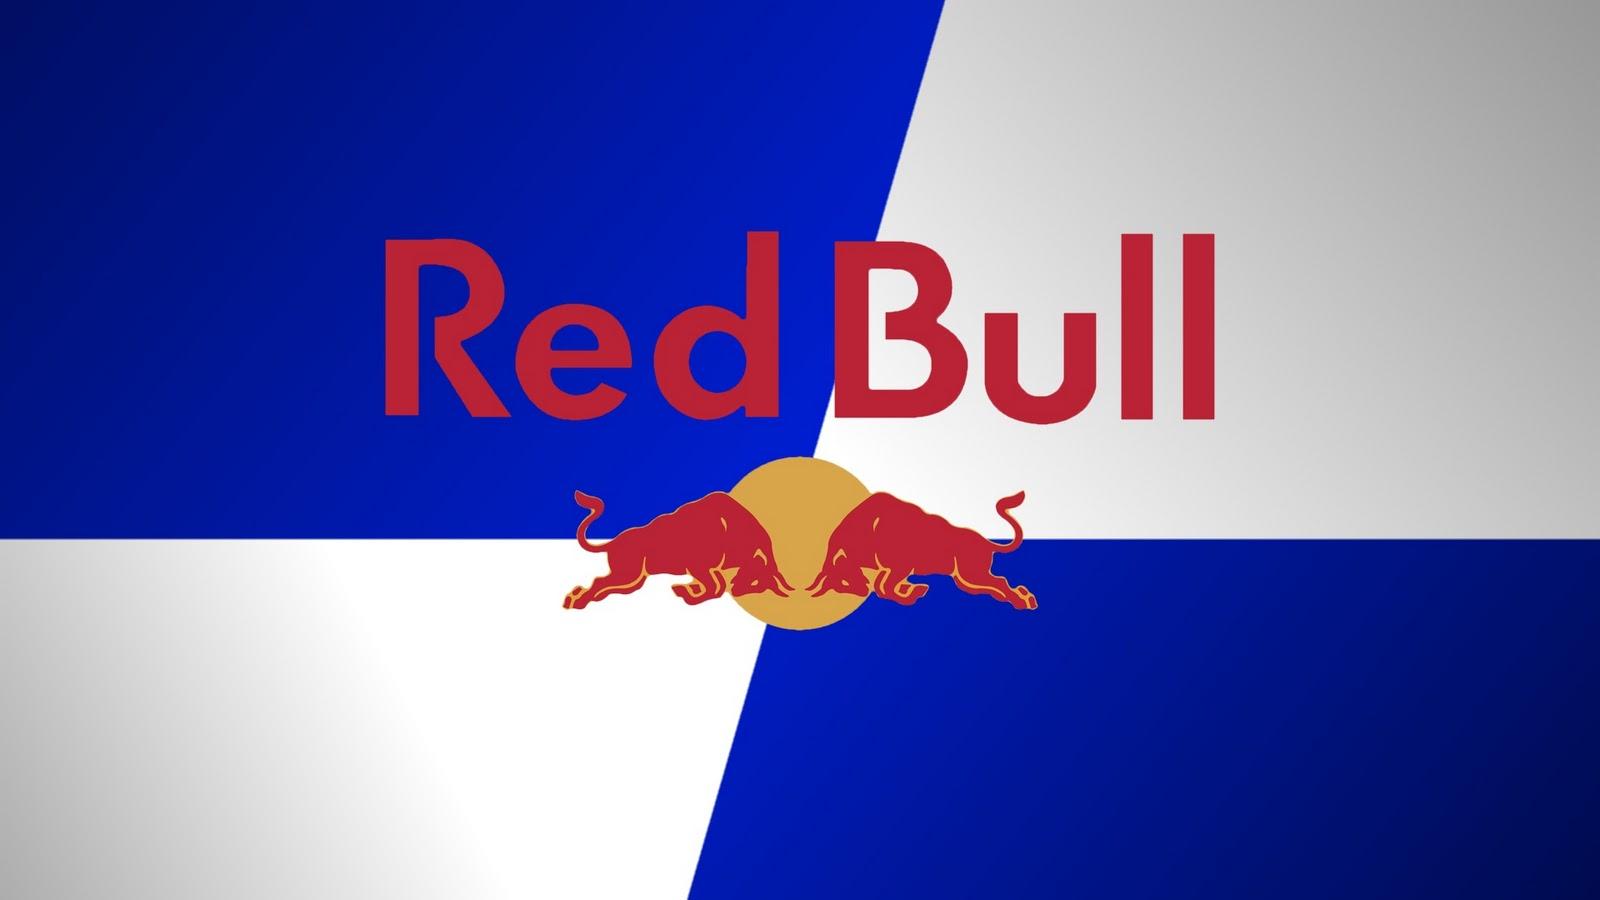 Red Bull Mini Kühlschrank Handbuch : Bachelorarbeit